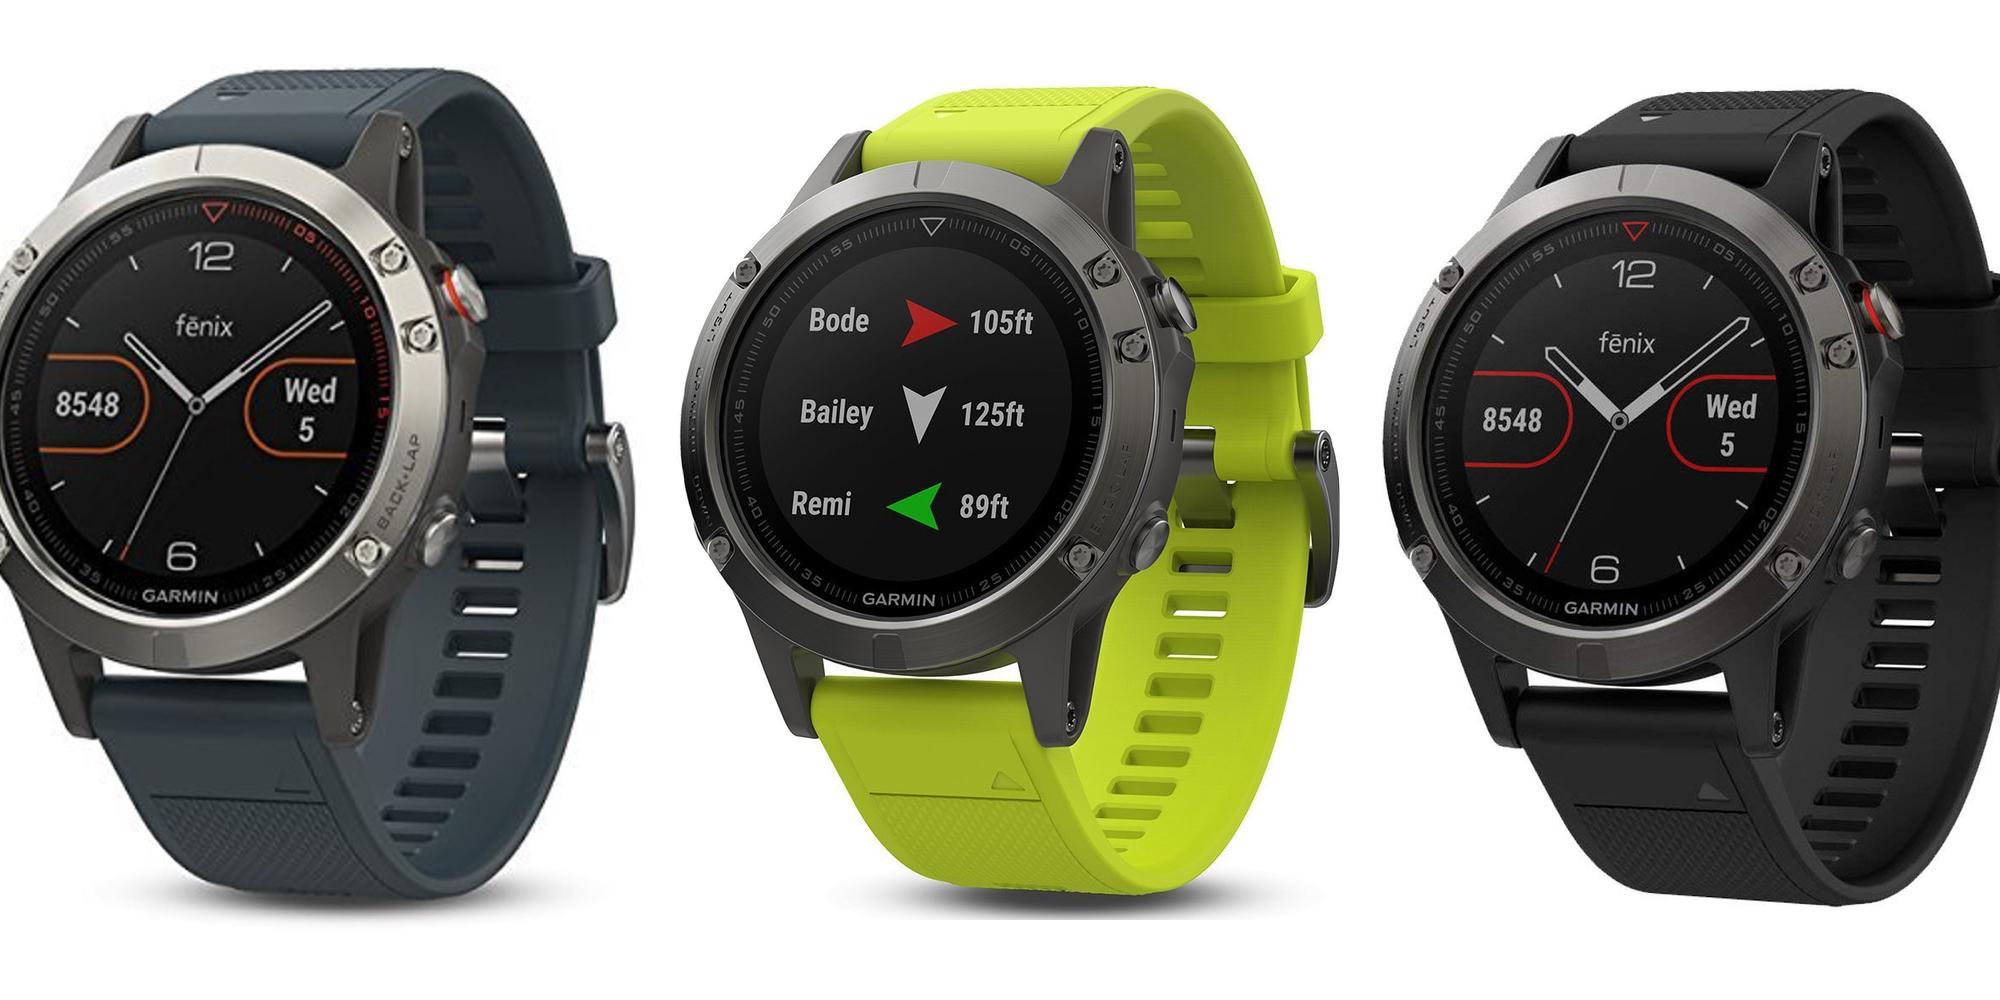 Garmin Fenix 5 GPS Smartwatch gets a $150 price cut to new Amazon low at $400 shipped